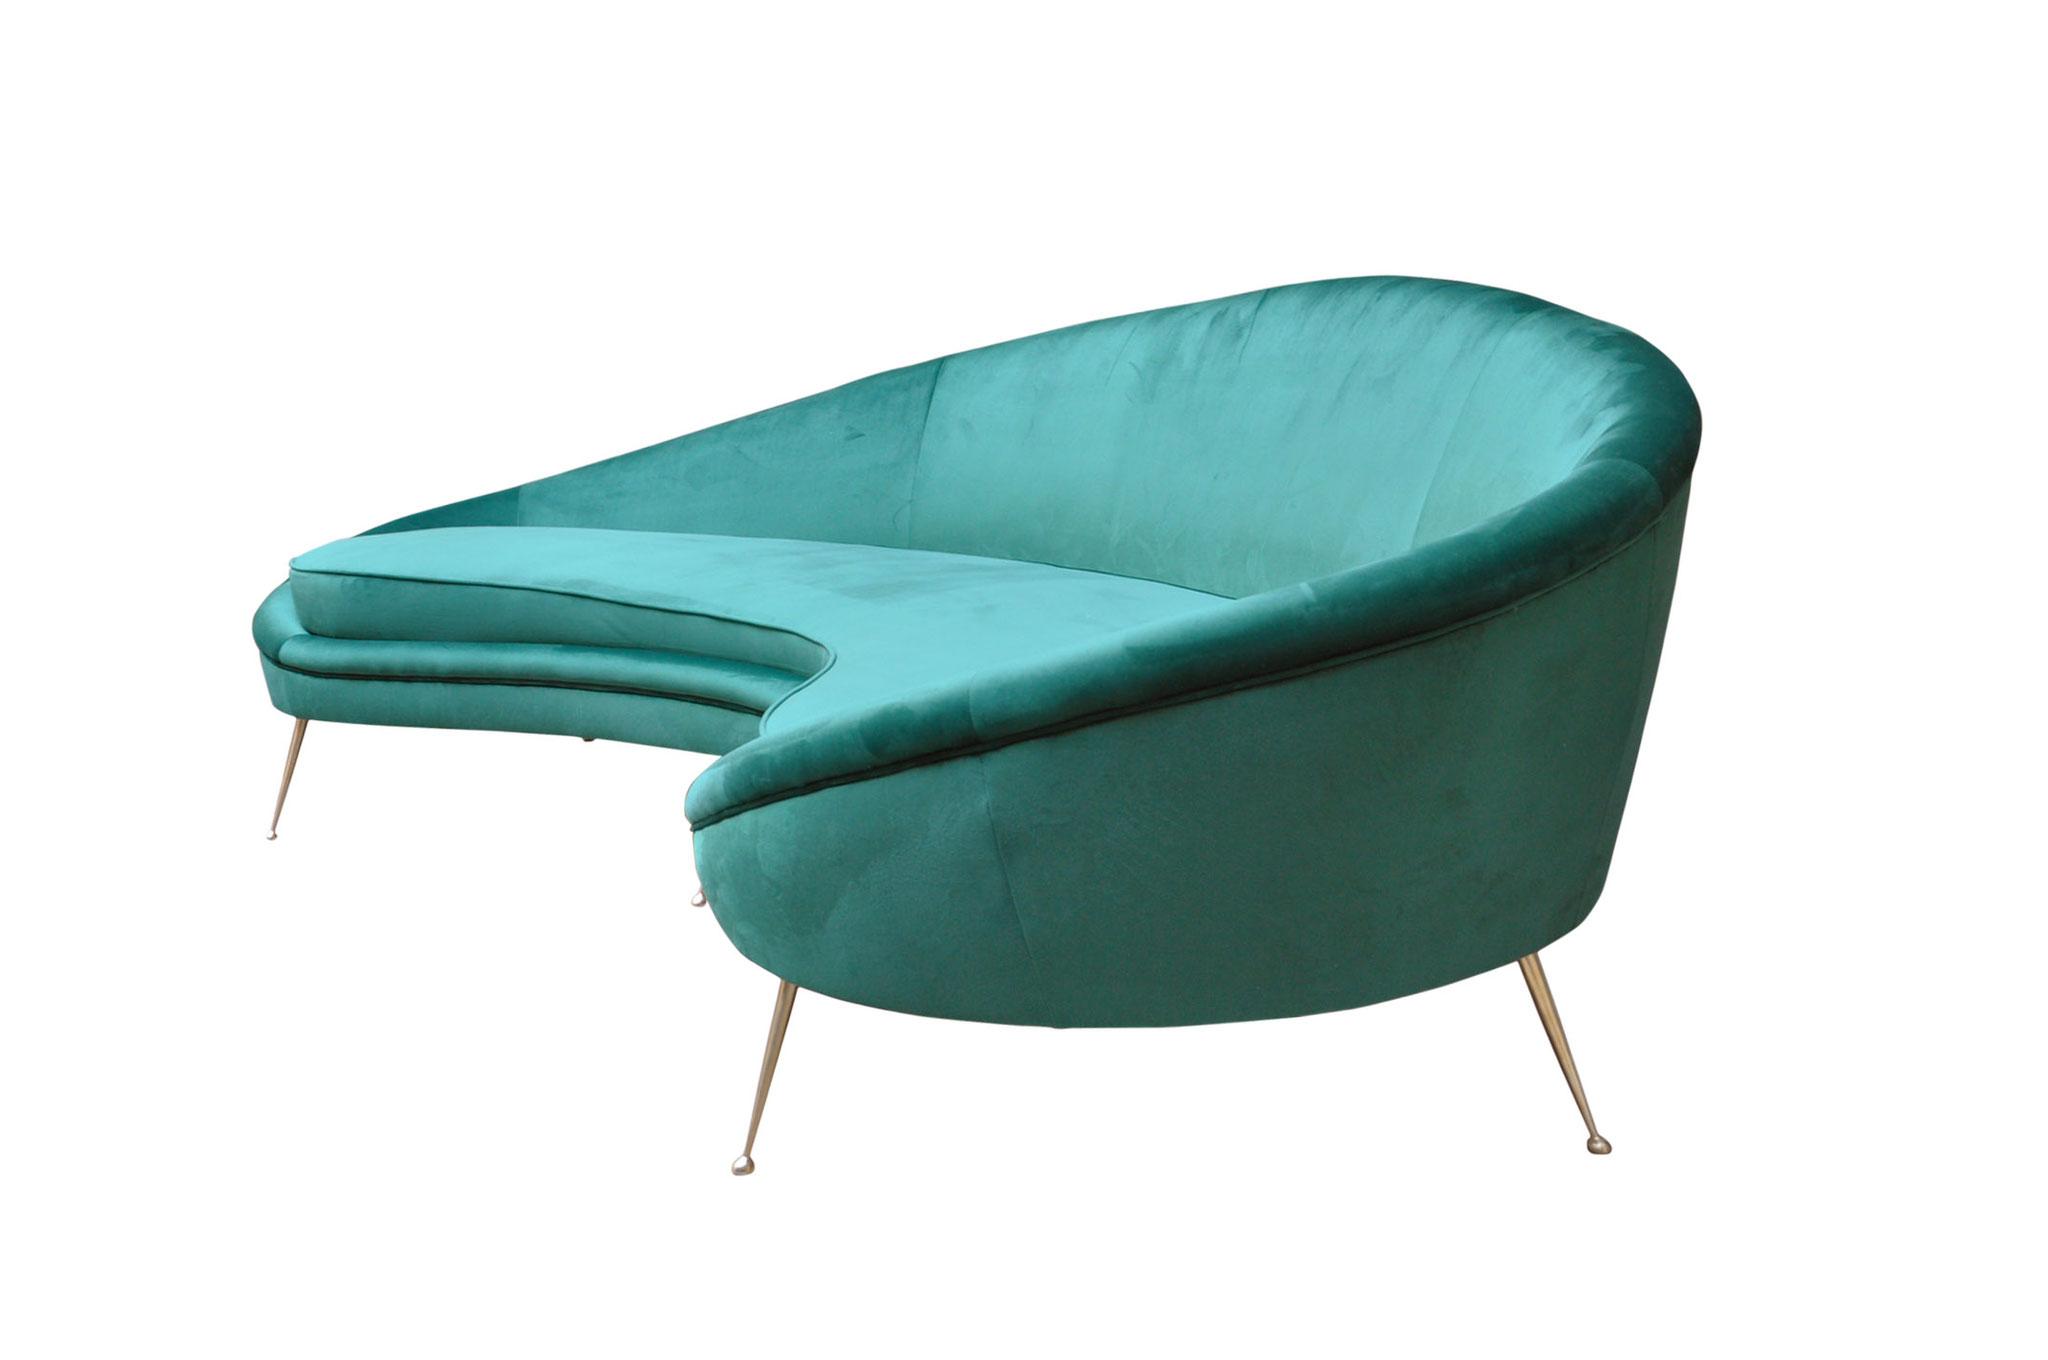 ico parisi comma sofa brass feet 1950s